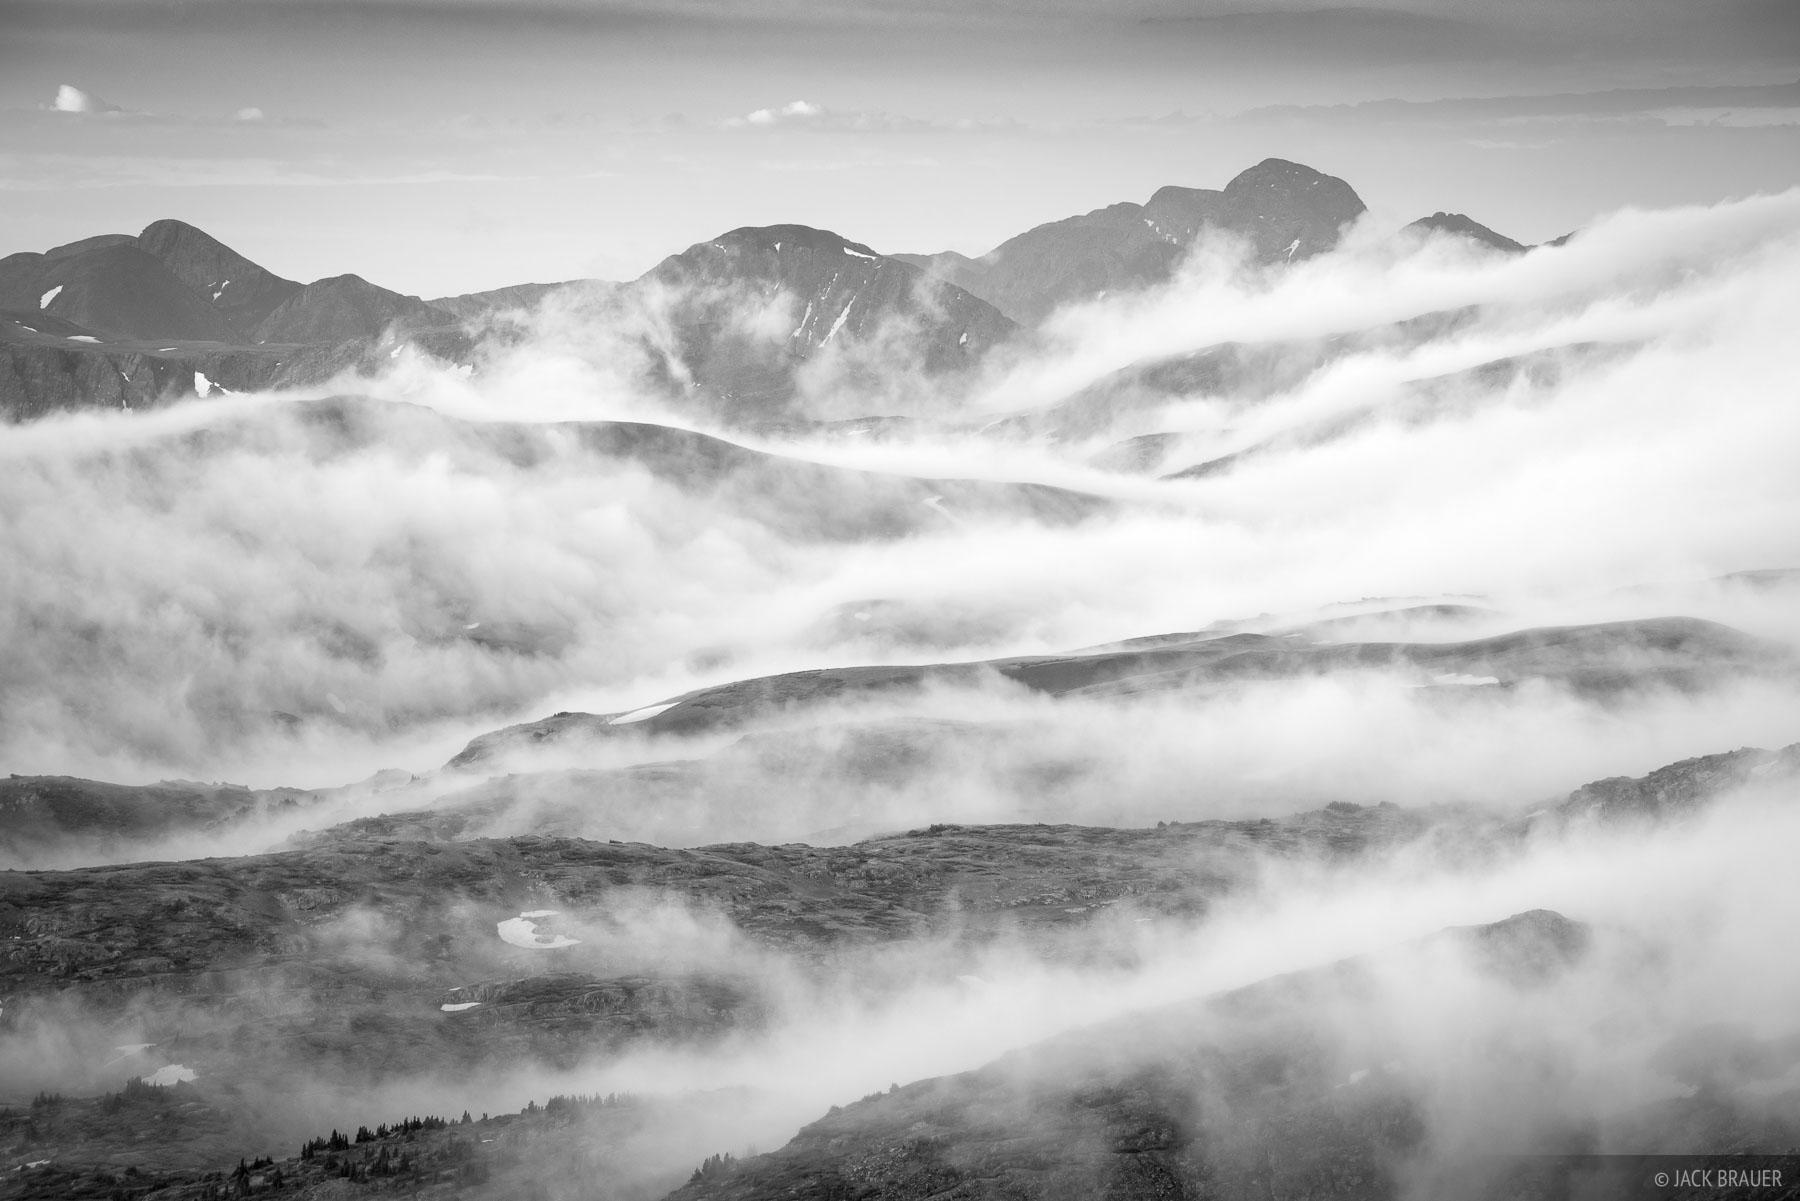 Colorado, San Juan Mountains, Stony Pass, Weminuche Wilderness, photo